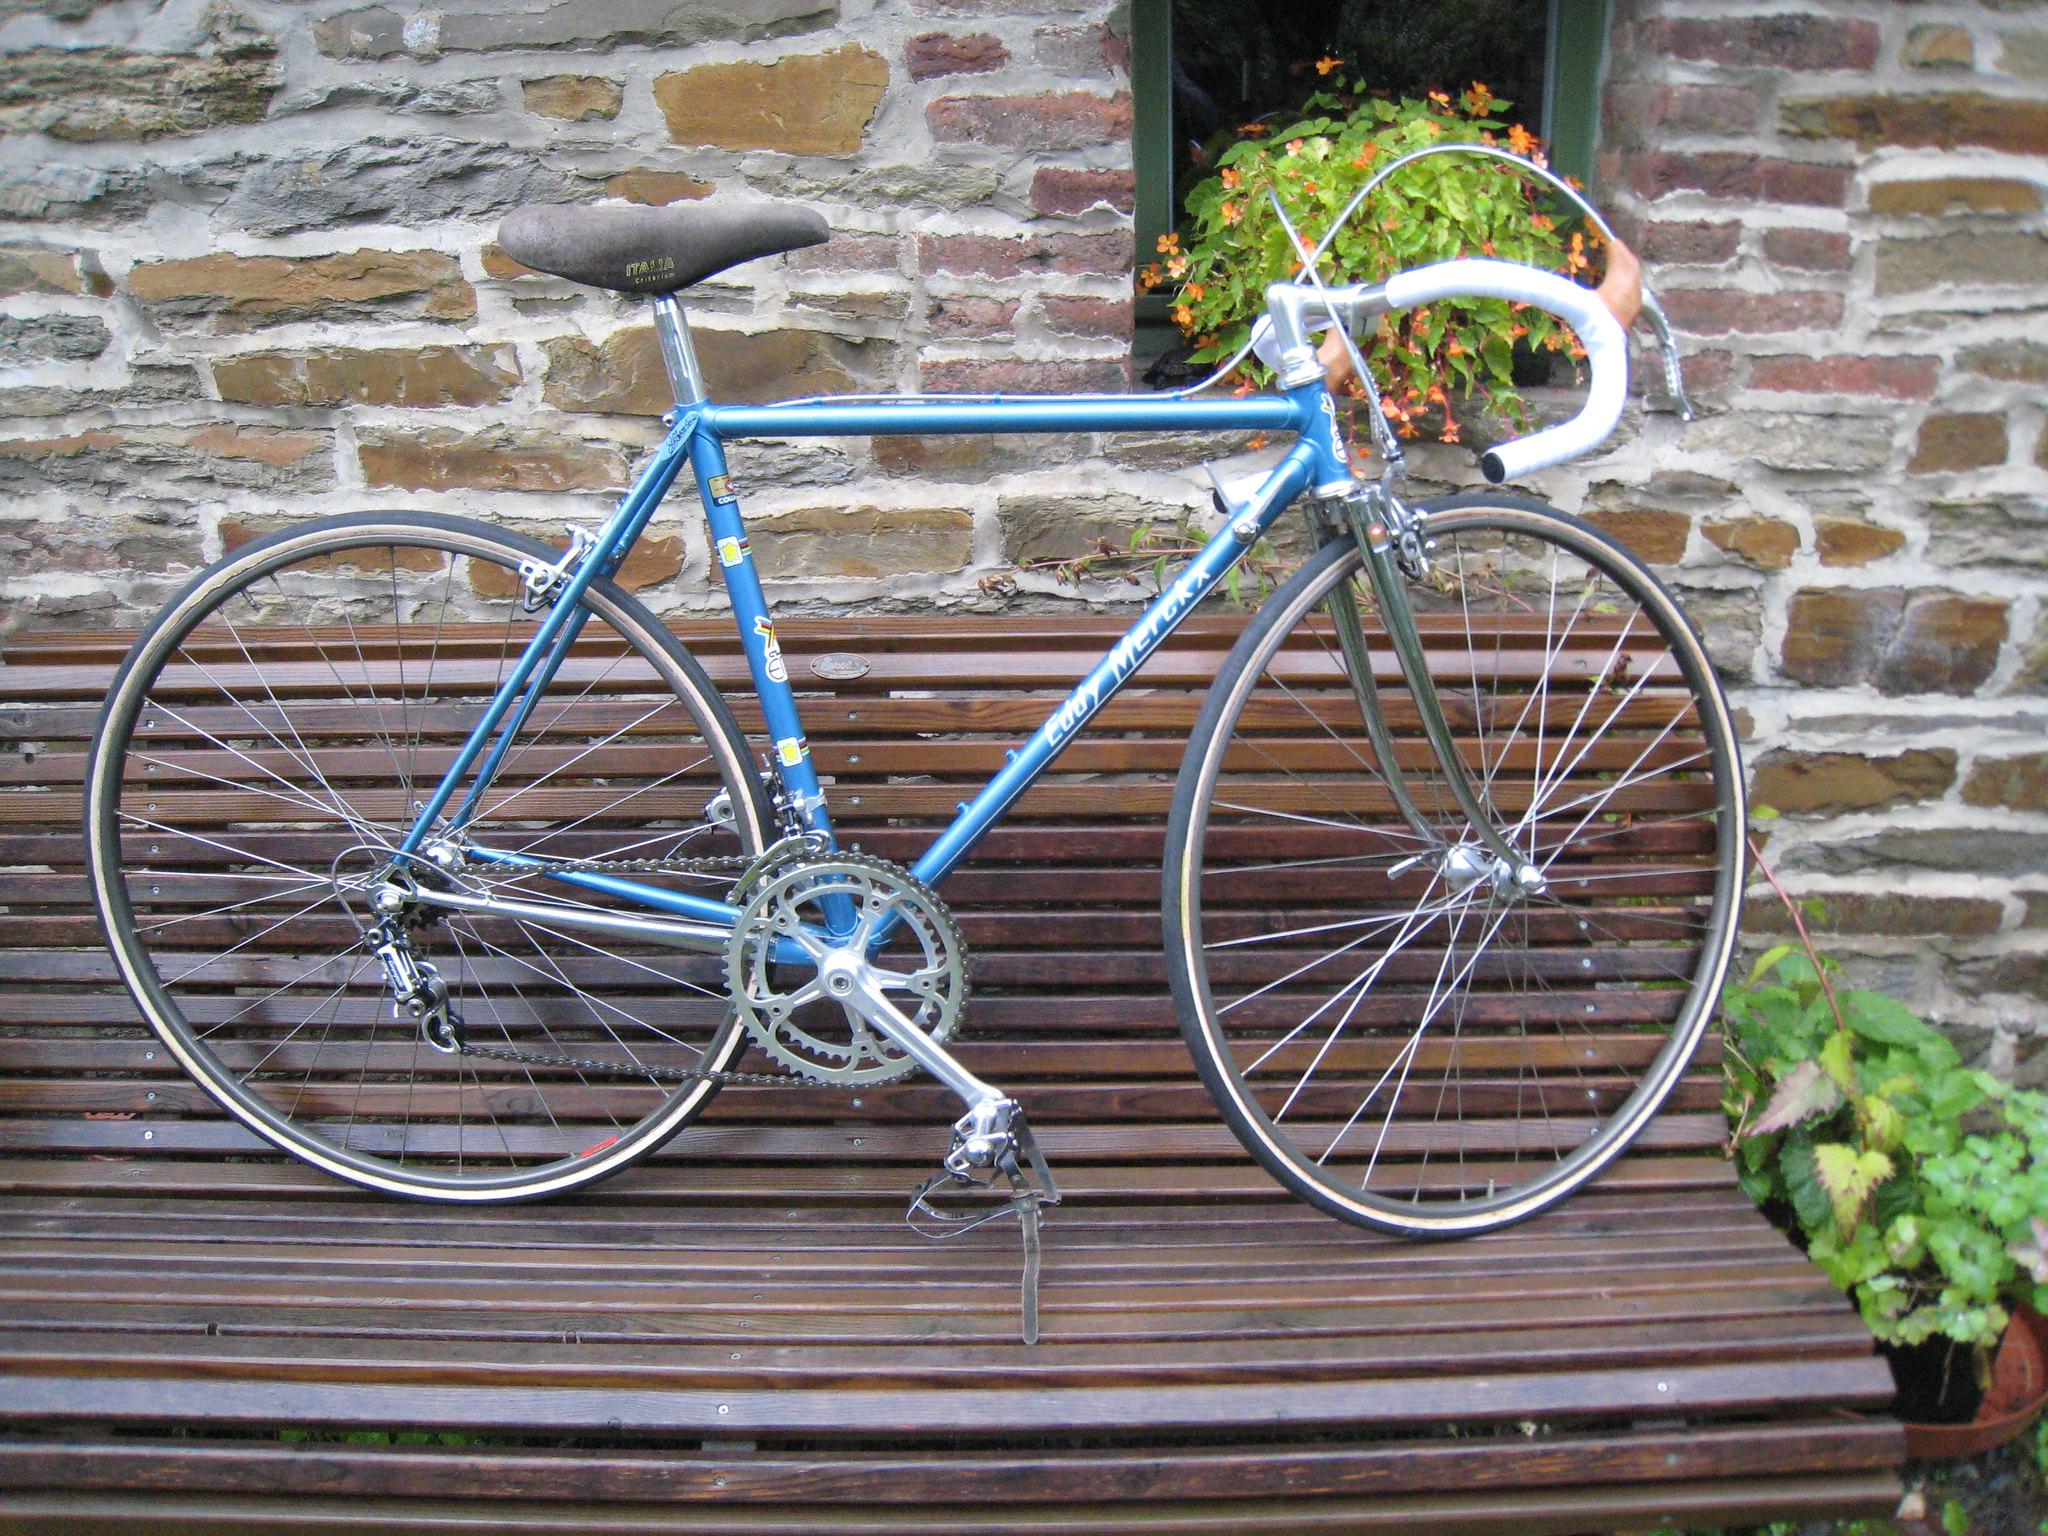 Eddy Merckx 1980 Bis 44137360494_3c41ff0fa0_k